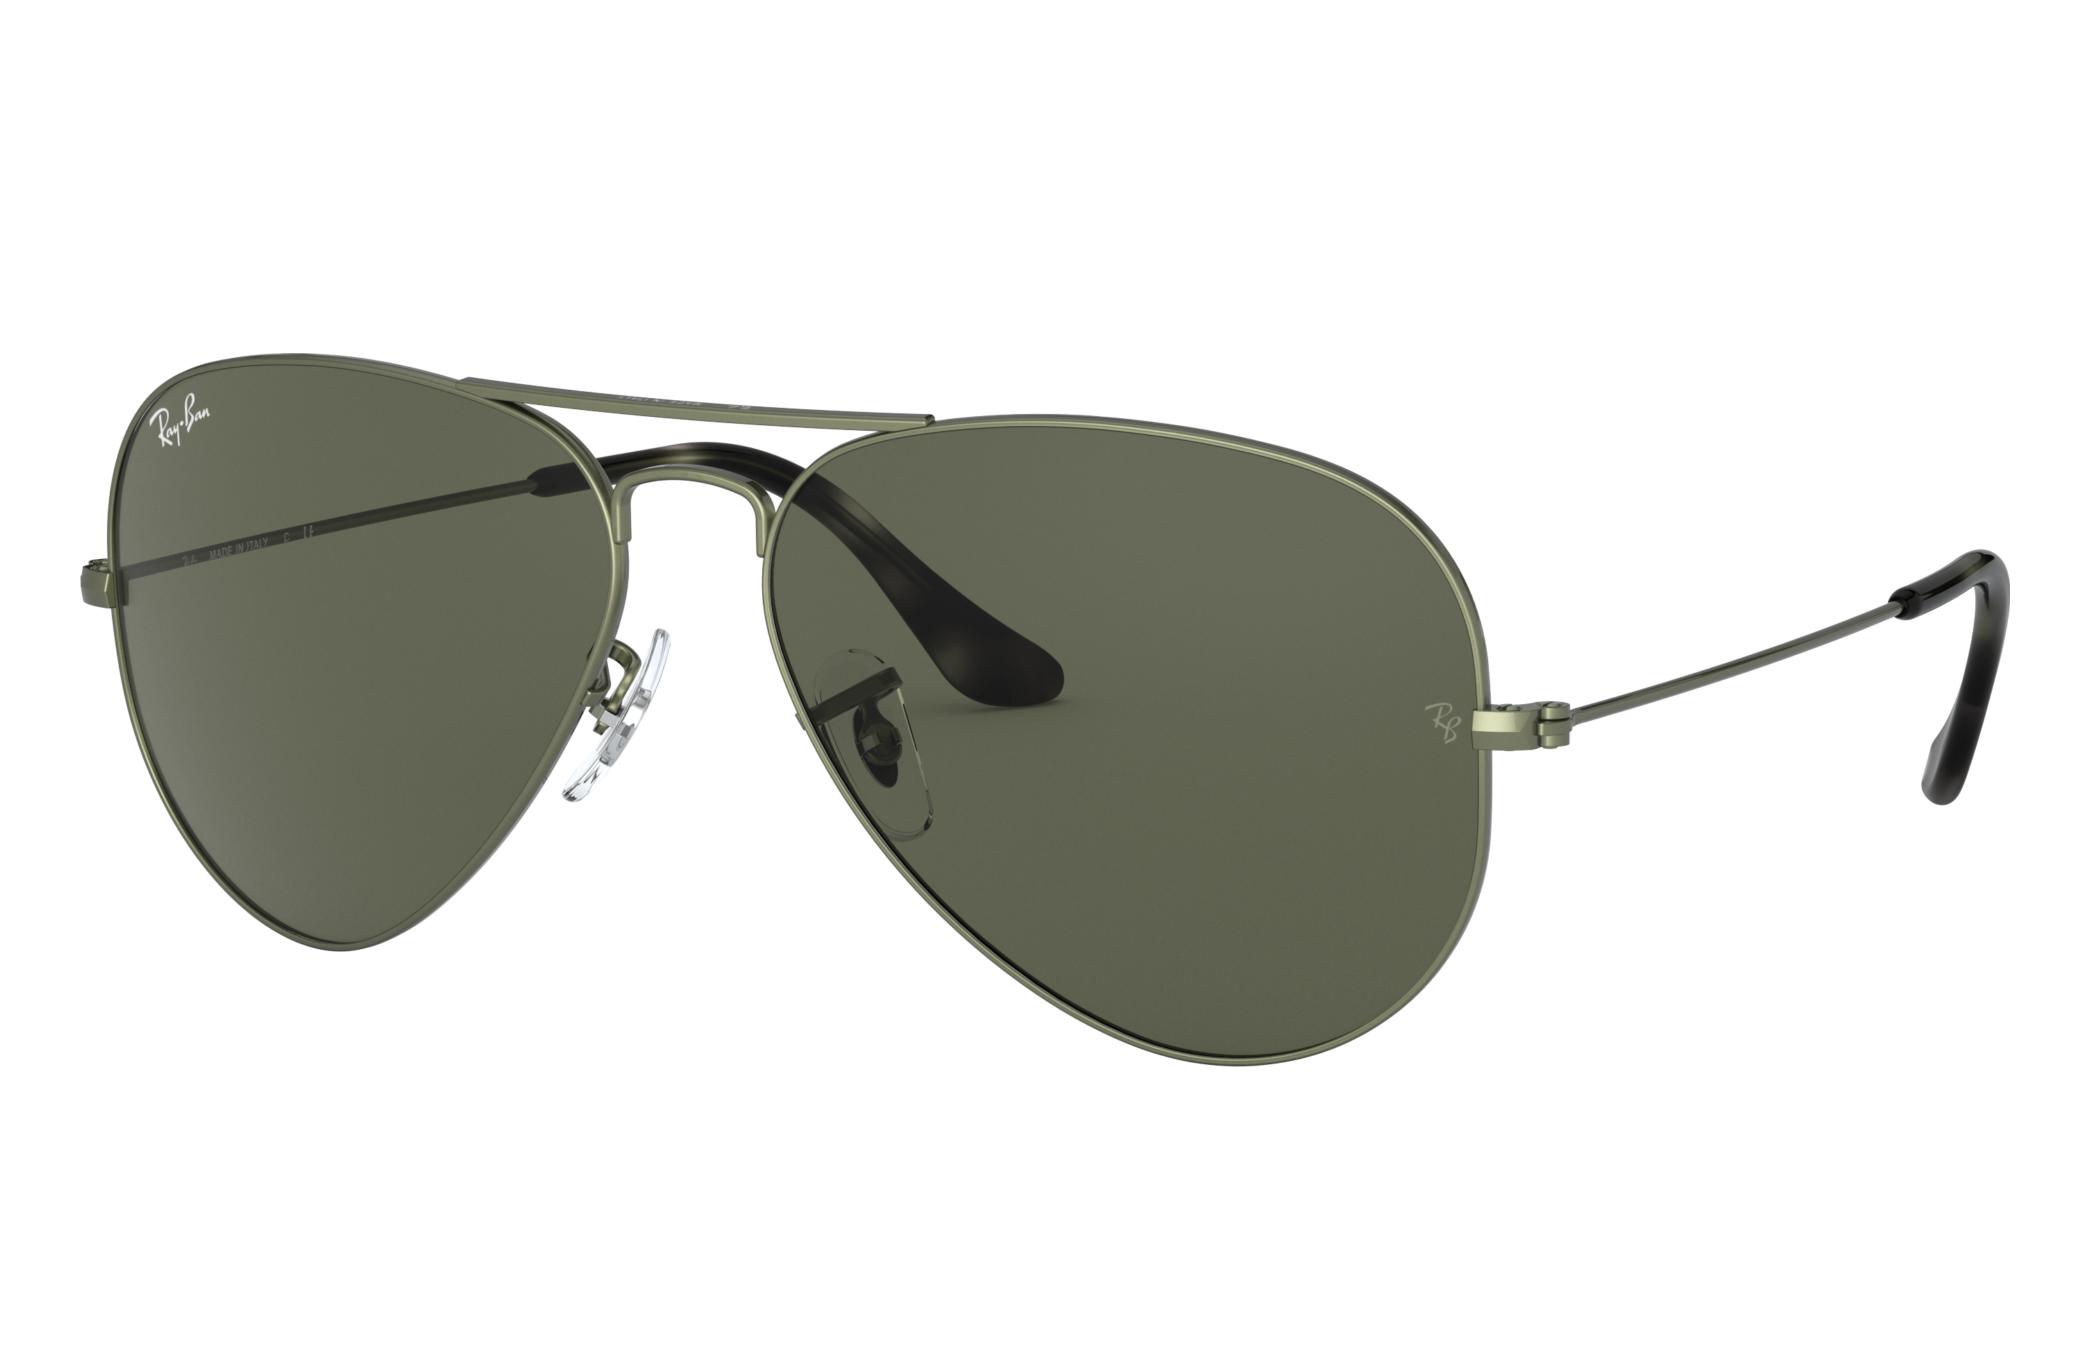 Ray-Ban Aviator Classic Green Metal, Green Lenses - RB3025